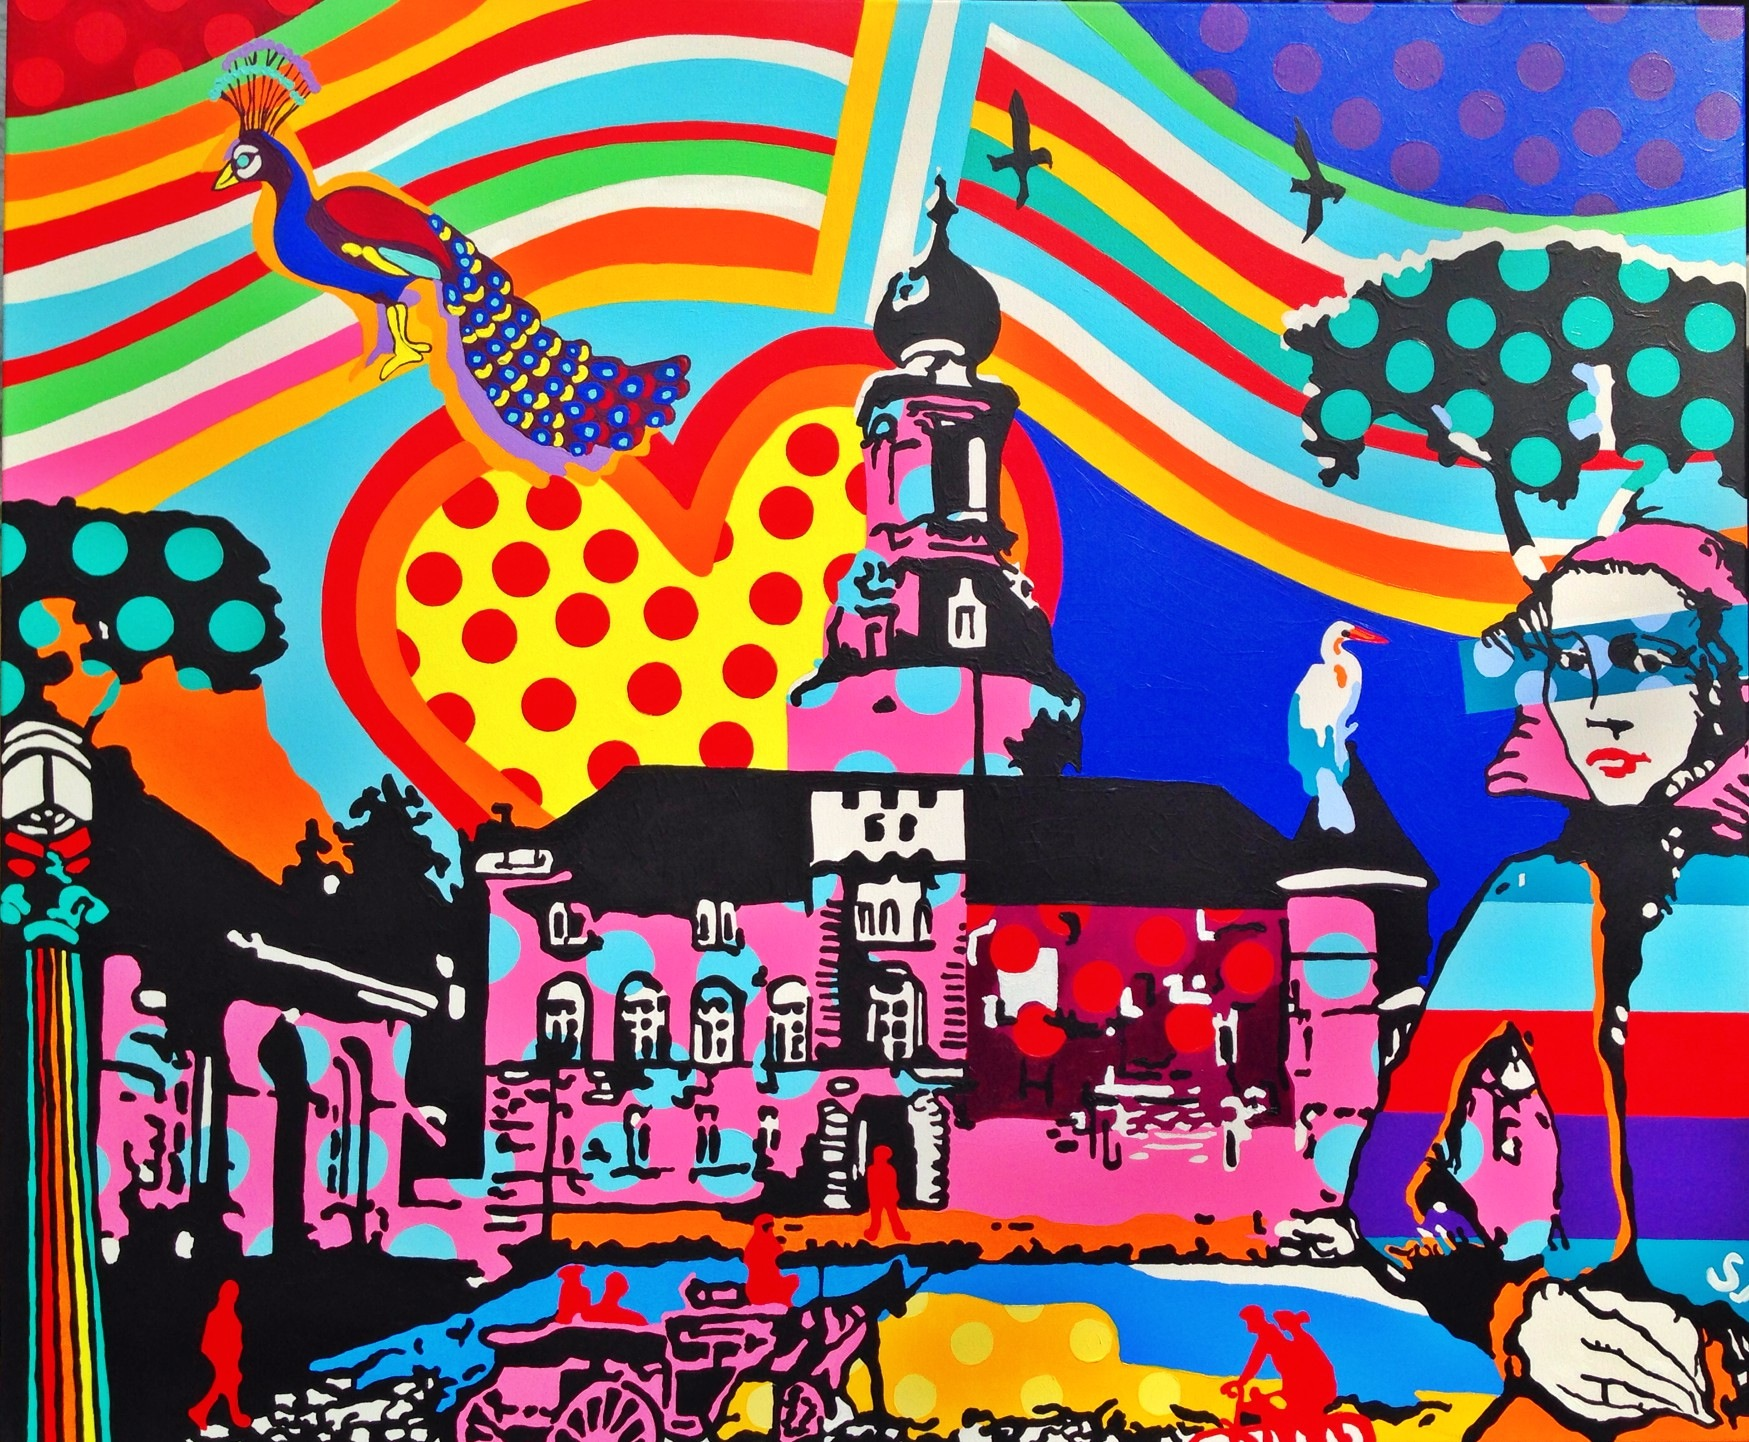 Bavarian Pop Art by Sylke Janßen